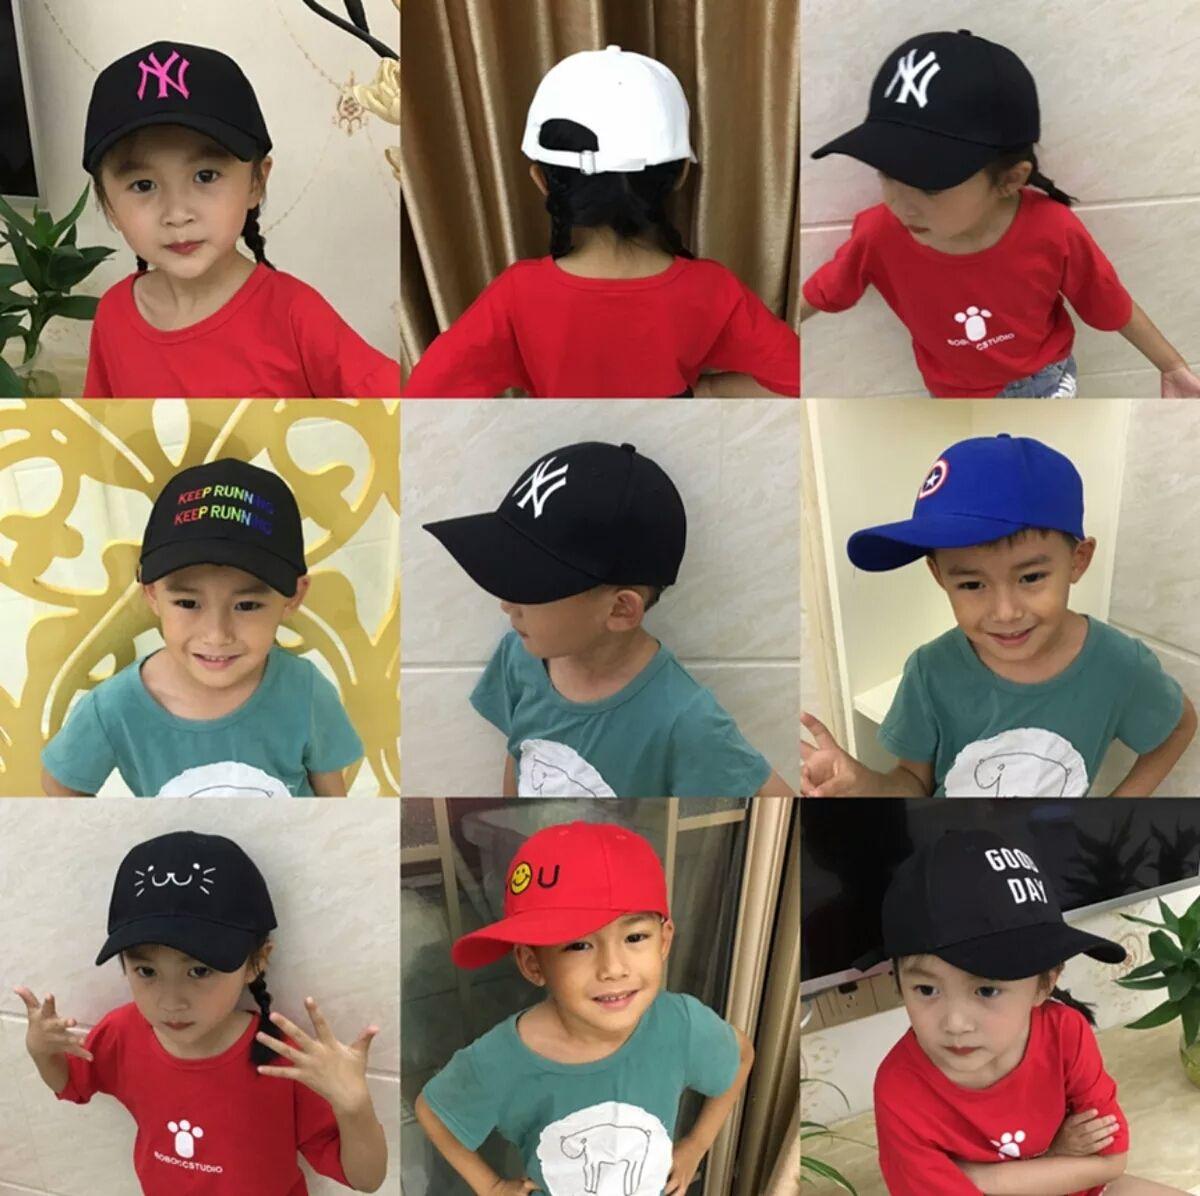 Compre Versão Coreana De Bonés De Beisebol Infantil 85b3c38101d